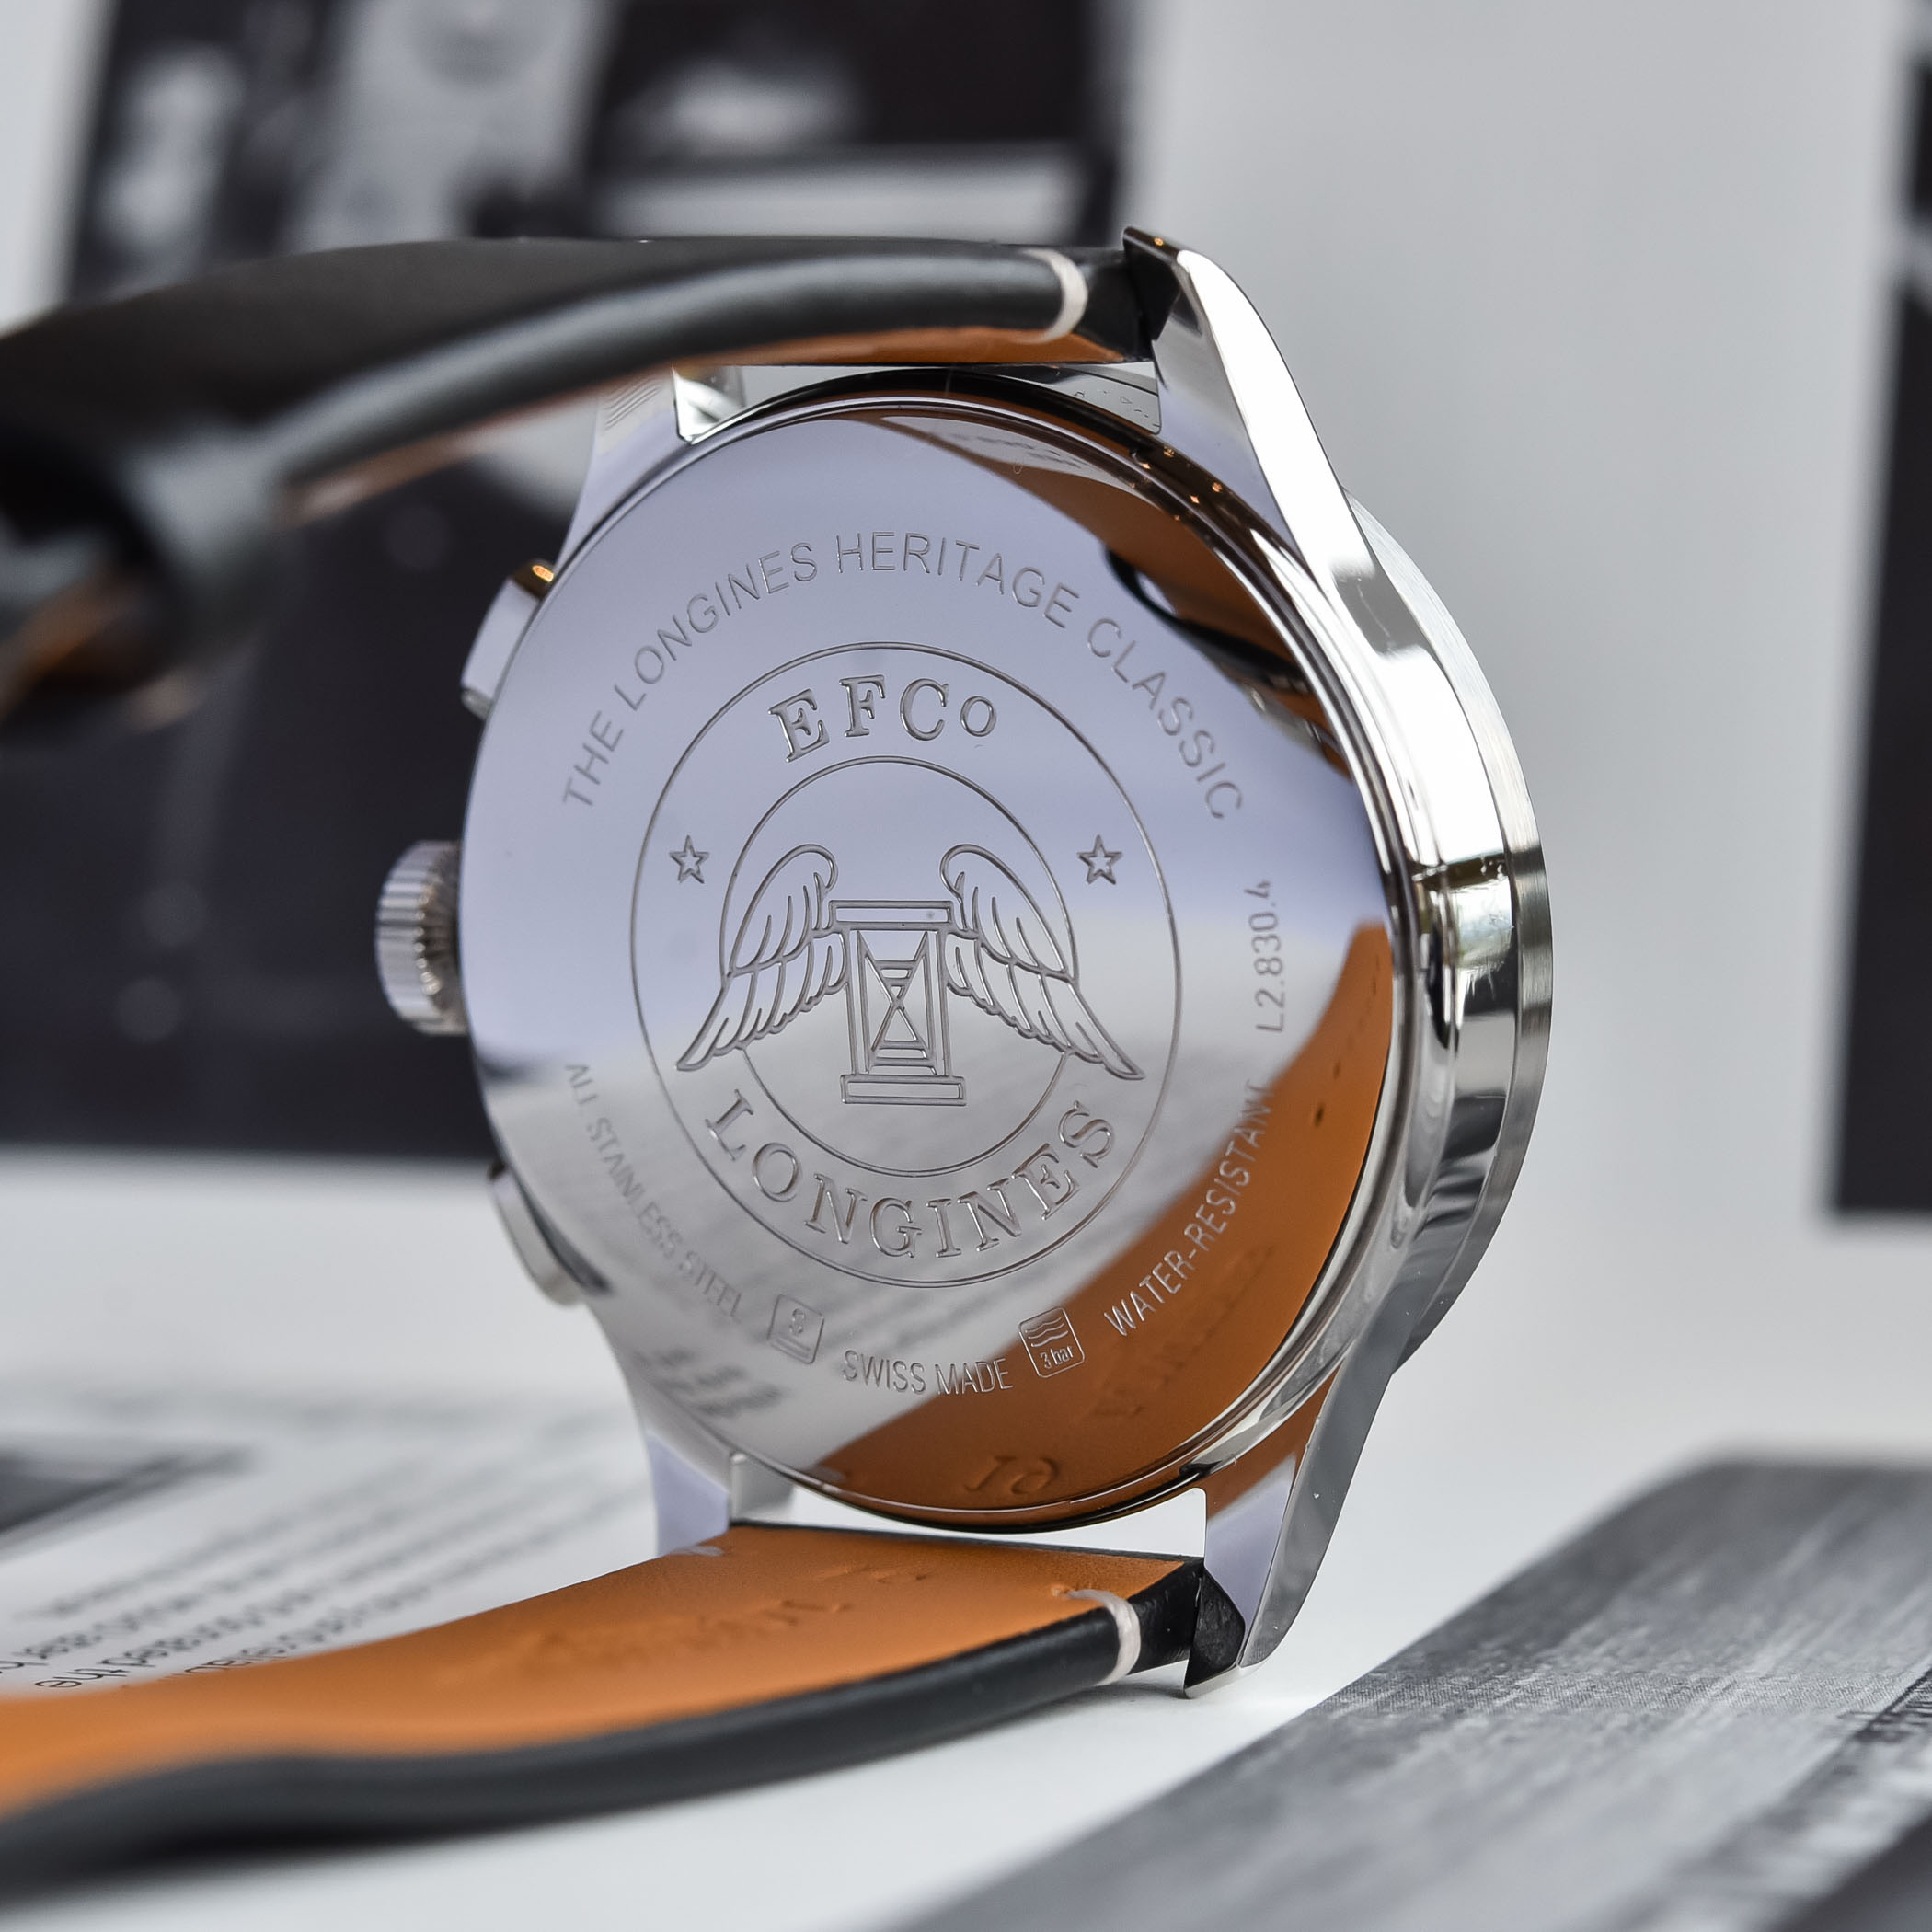 Trasera del Longines Heritage Classic Tuxedo Chronograph